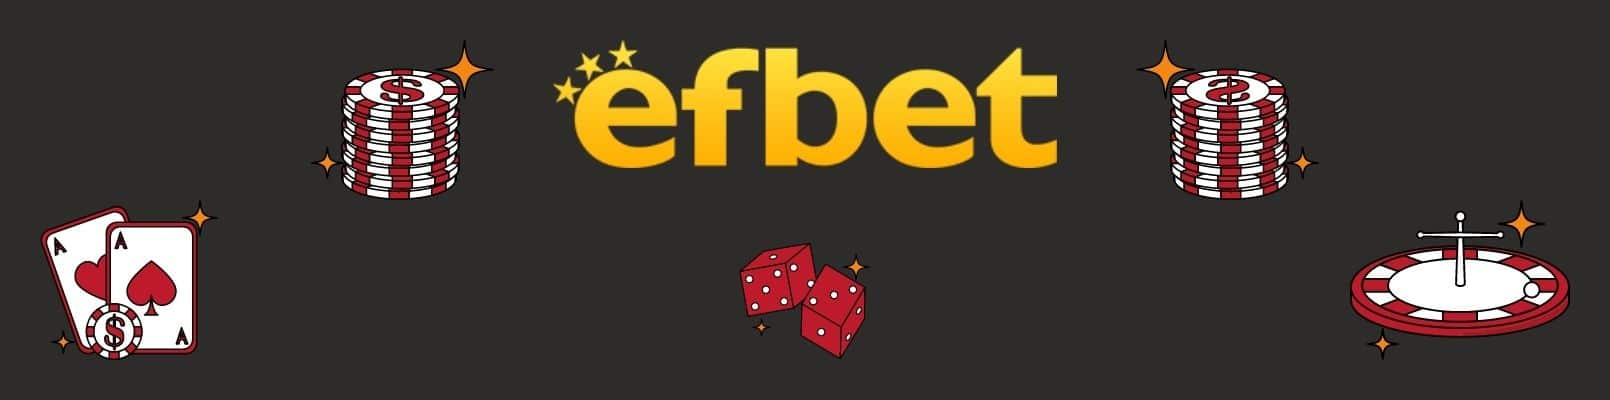 efbet cazinouri online noi